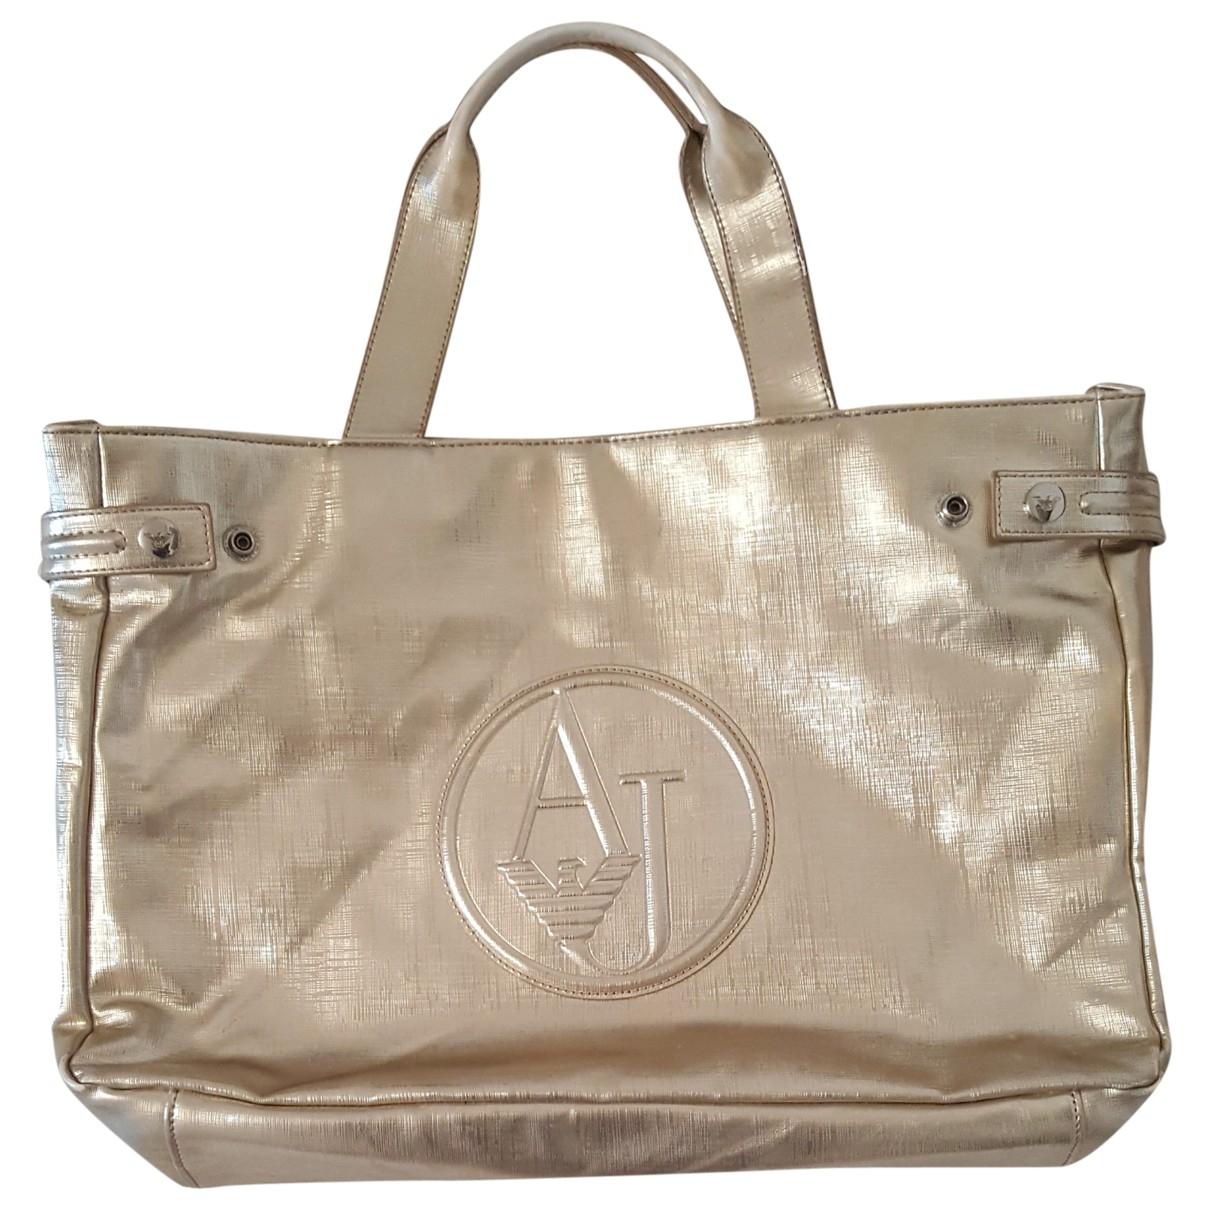 Armani Jeans \N Gold handbag for Women \N